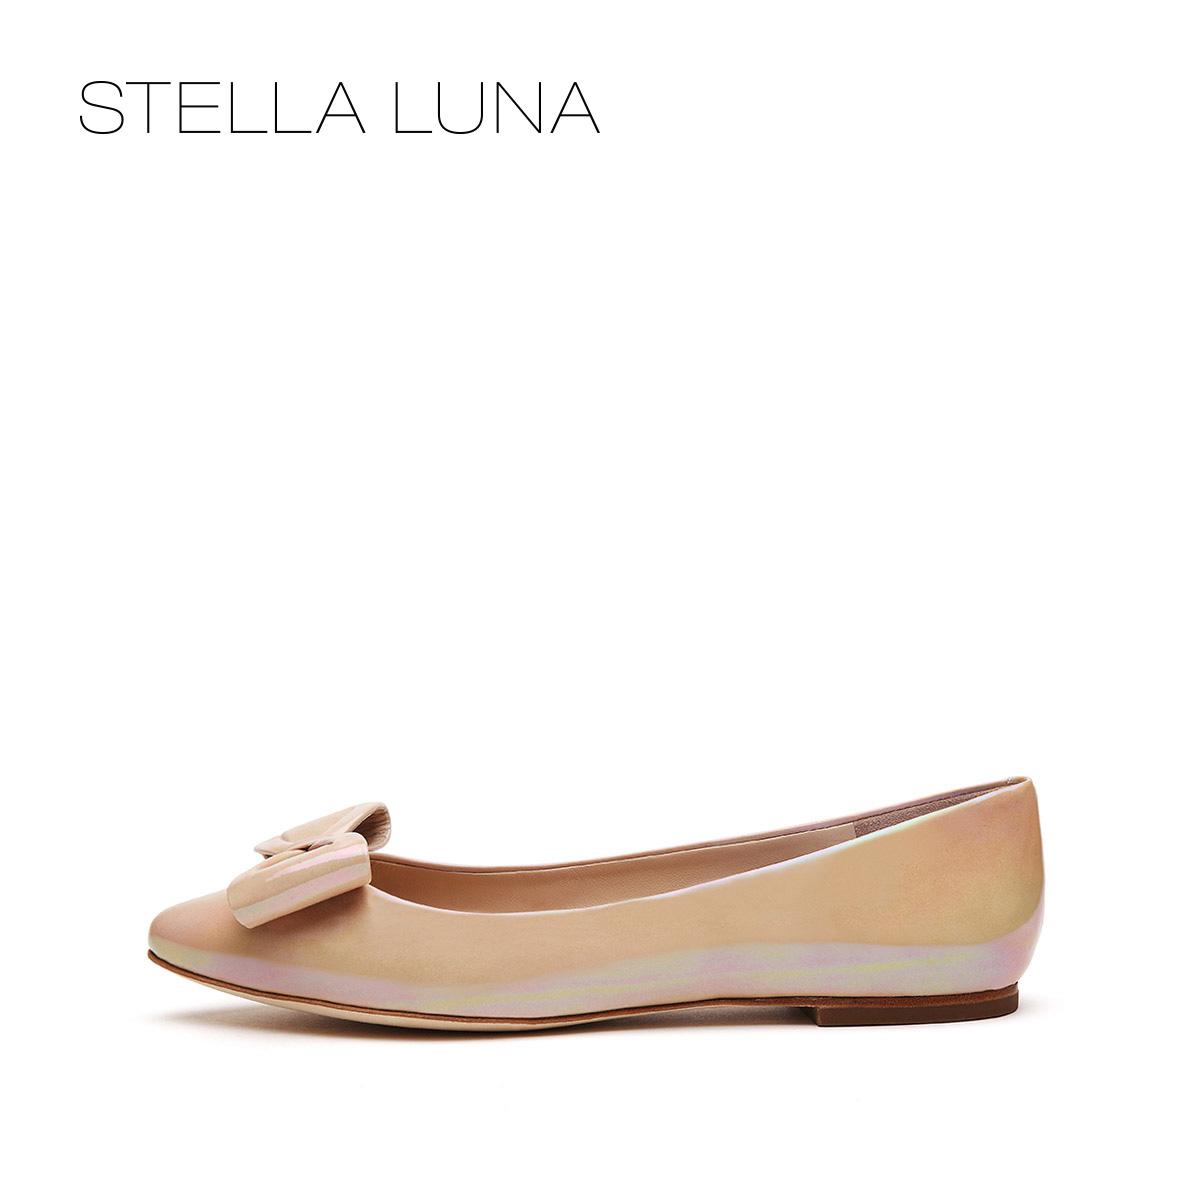 STELLA LUNA春夏尖头设计师款浅口女鞋牛皮蝴蝶结套脚平跟单鞋